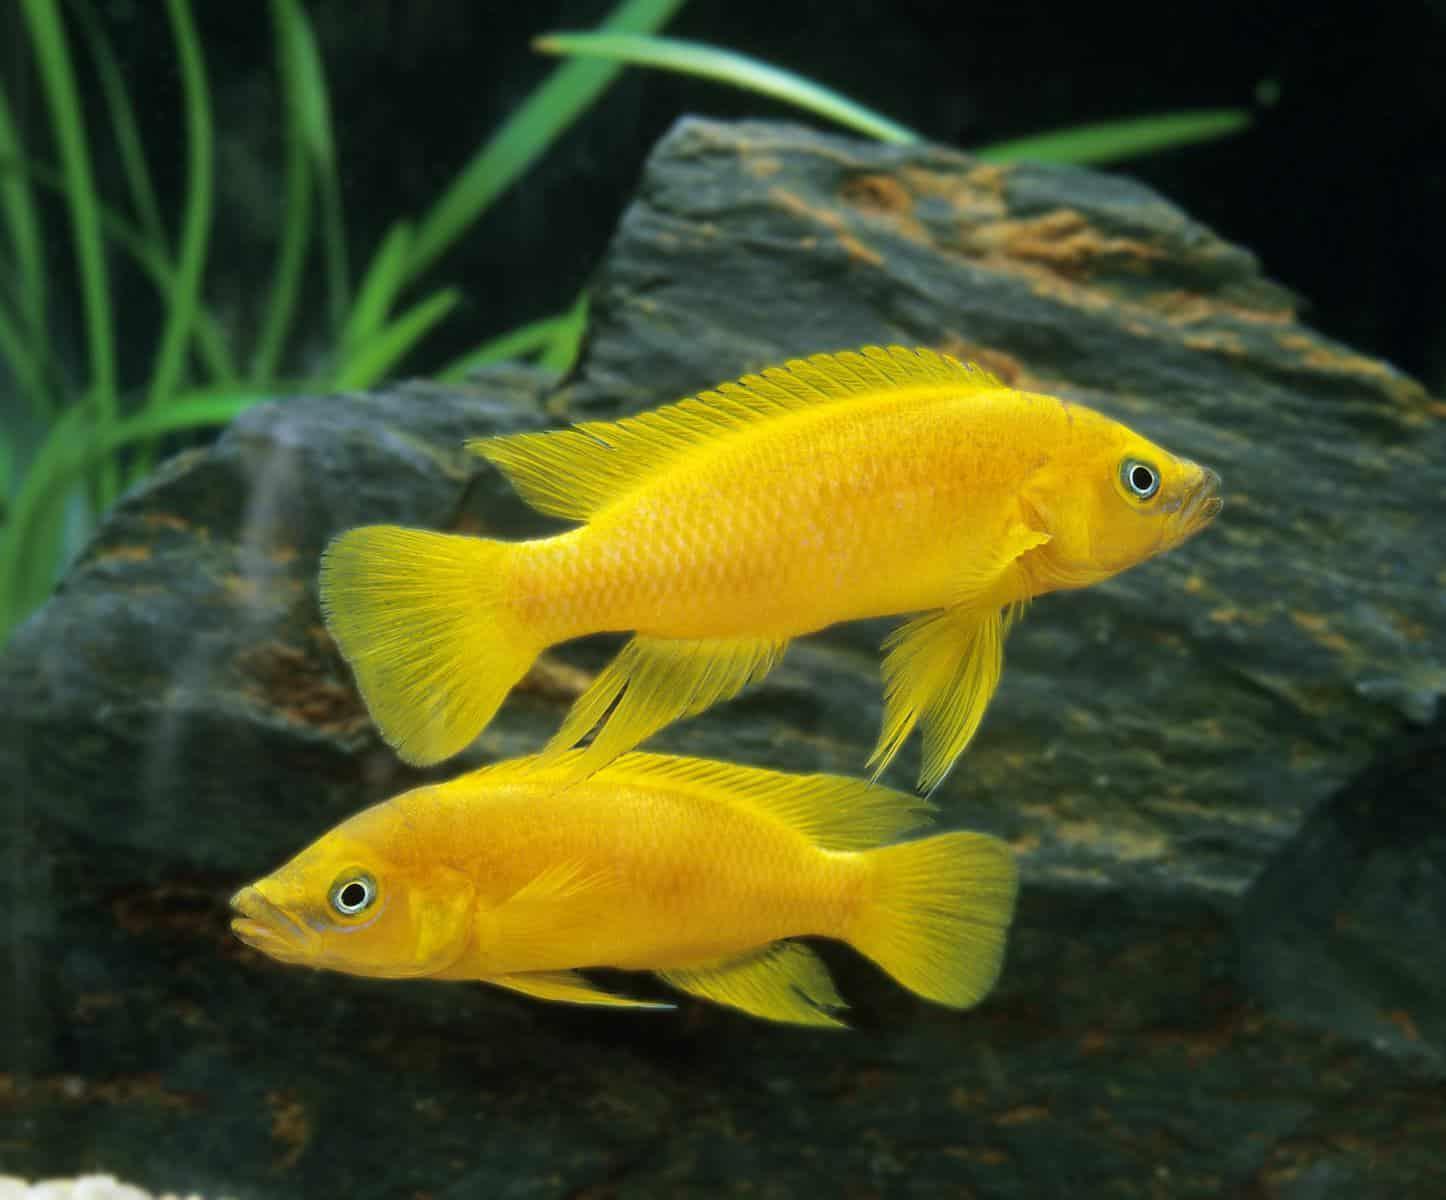 Lemon oscar fish in aquarium